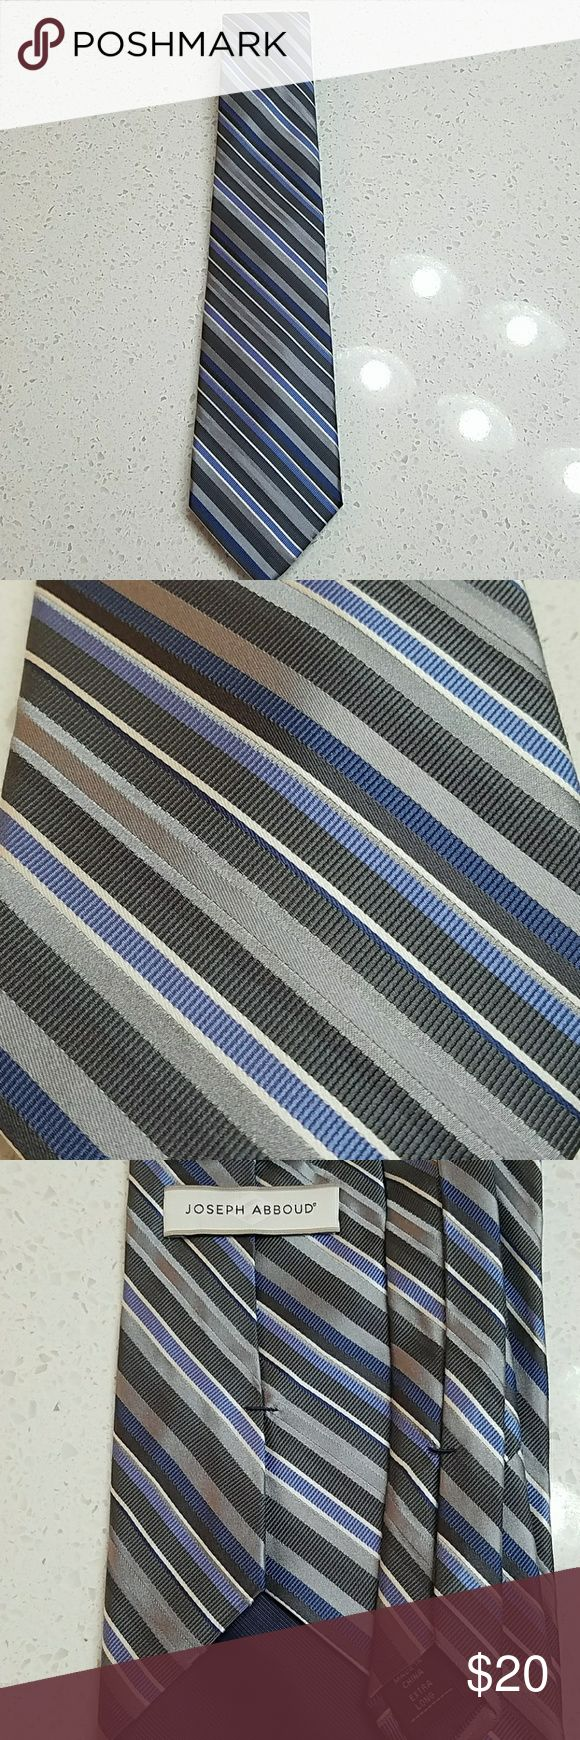 Joseph Abboud Extra Long Tie Dark grey, light gray, blue, white diagonal stripe. Silk. Joseph Abboud Accessories Ties